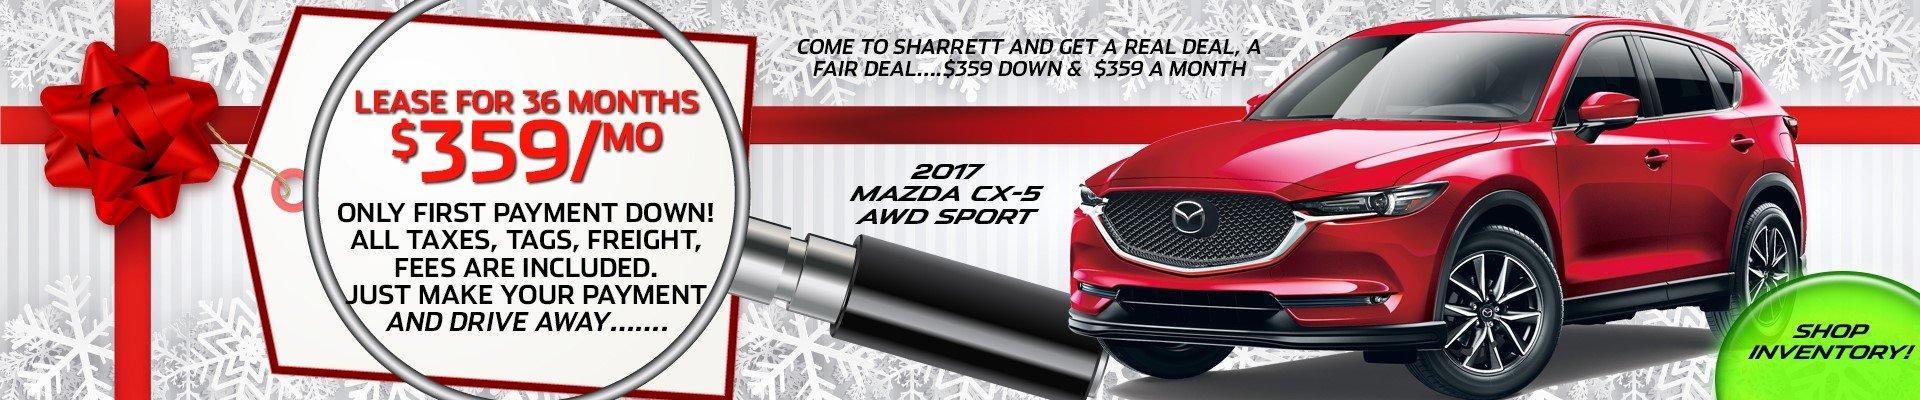 2017 Mazda CX-5 AWD Sport